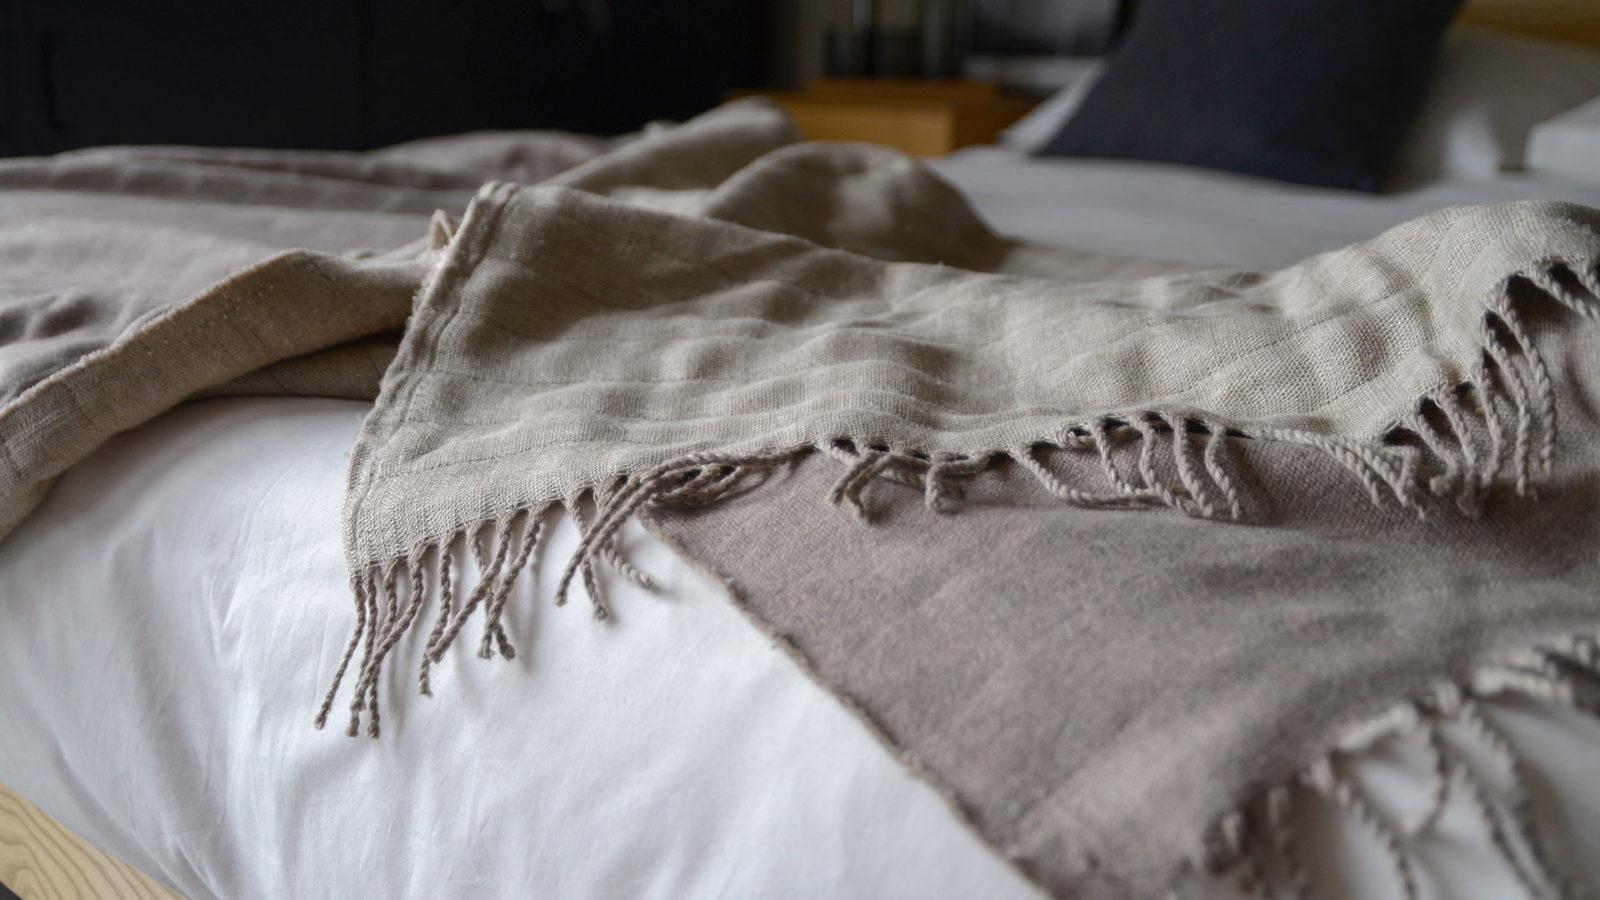 lambswool and linen blanket